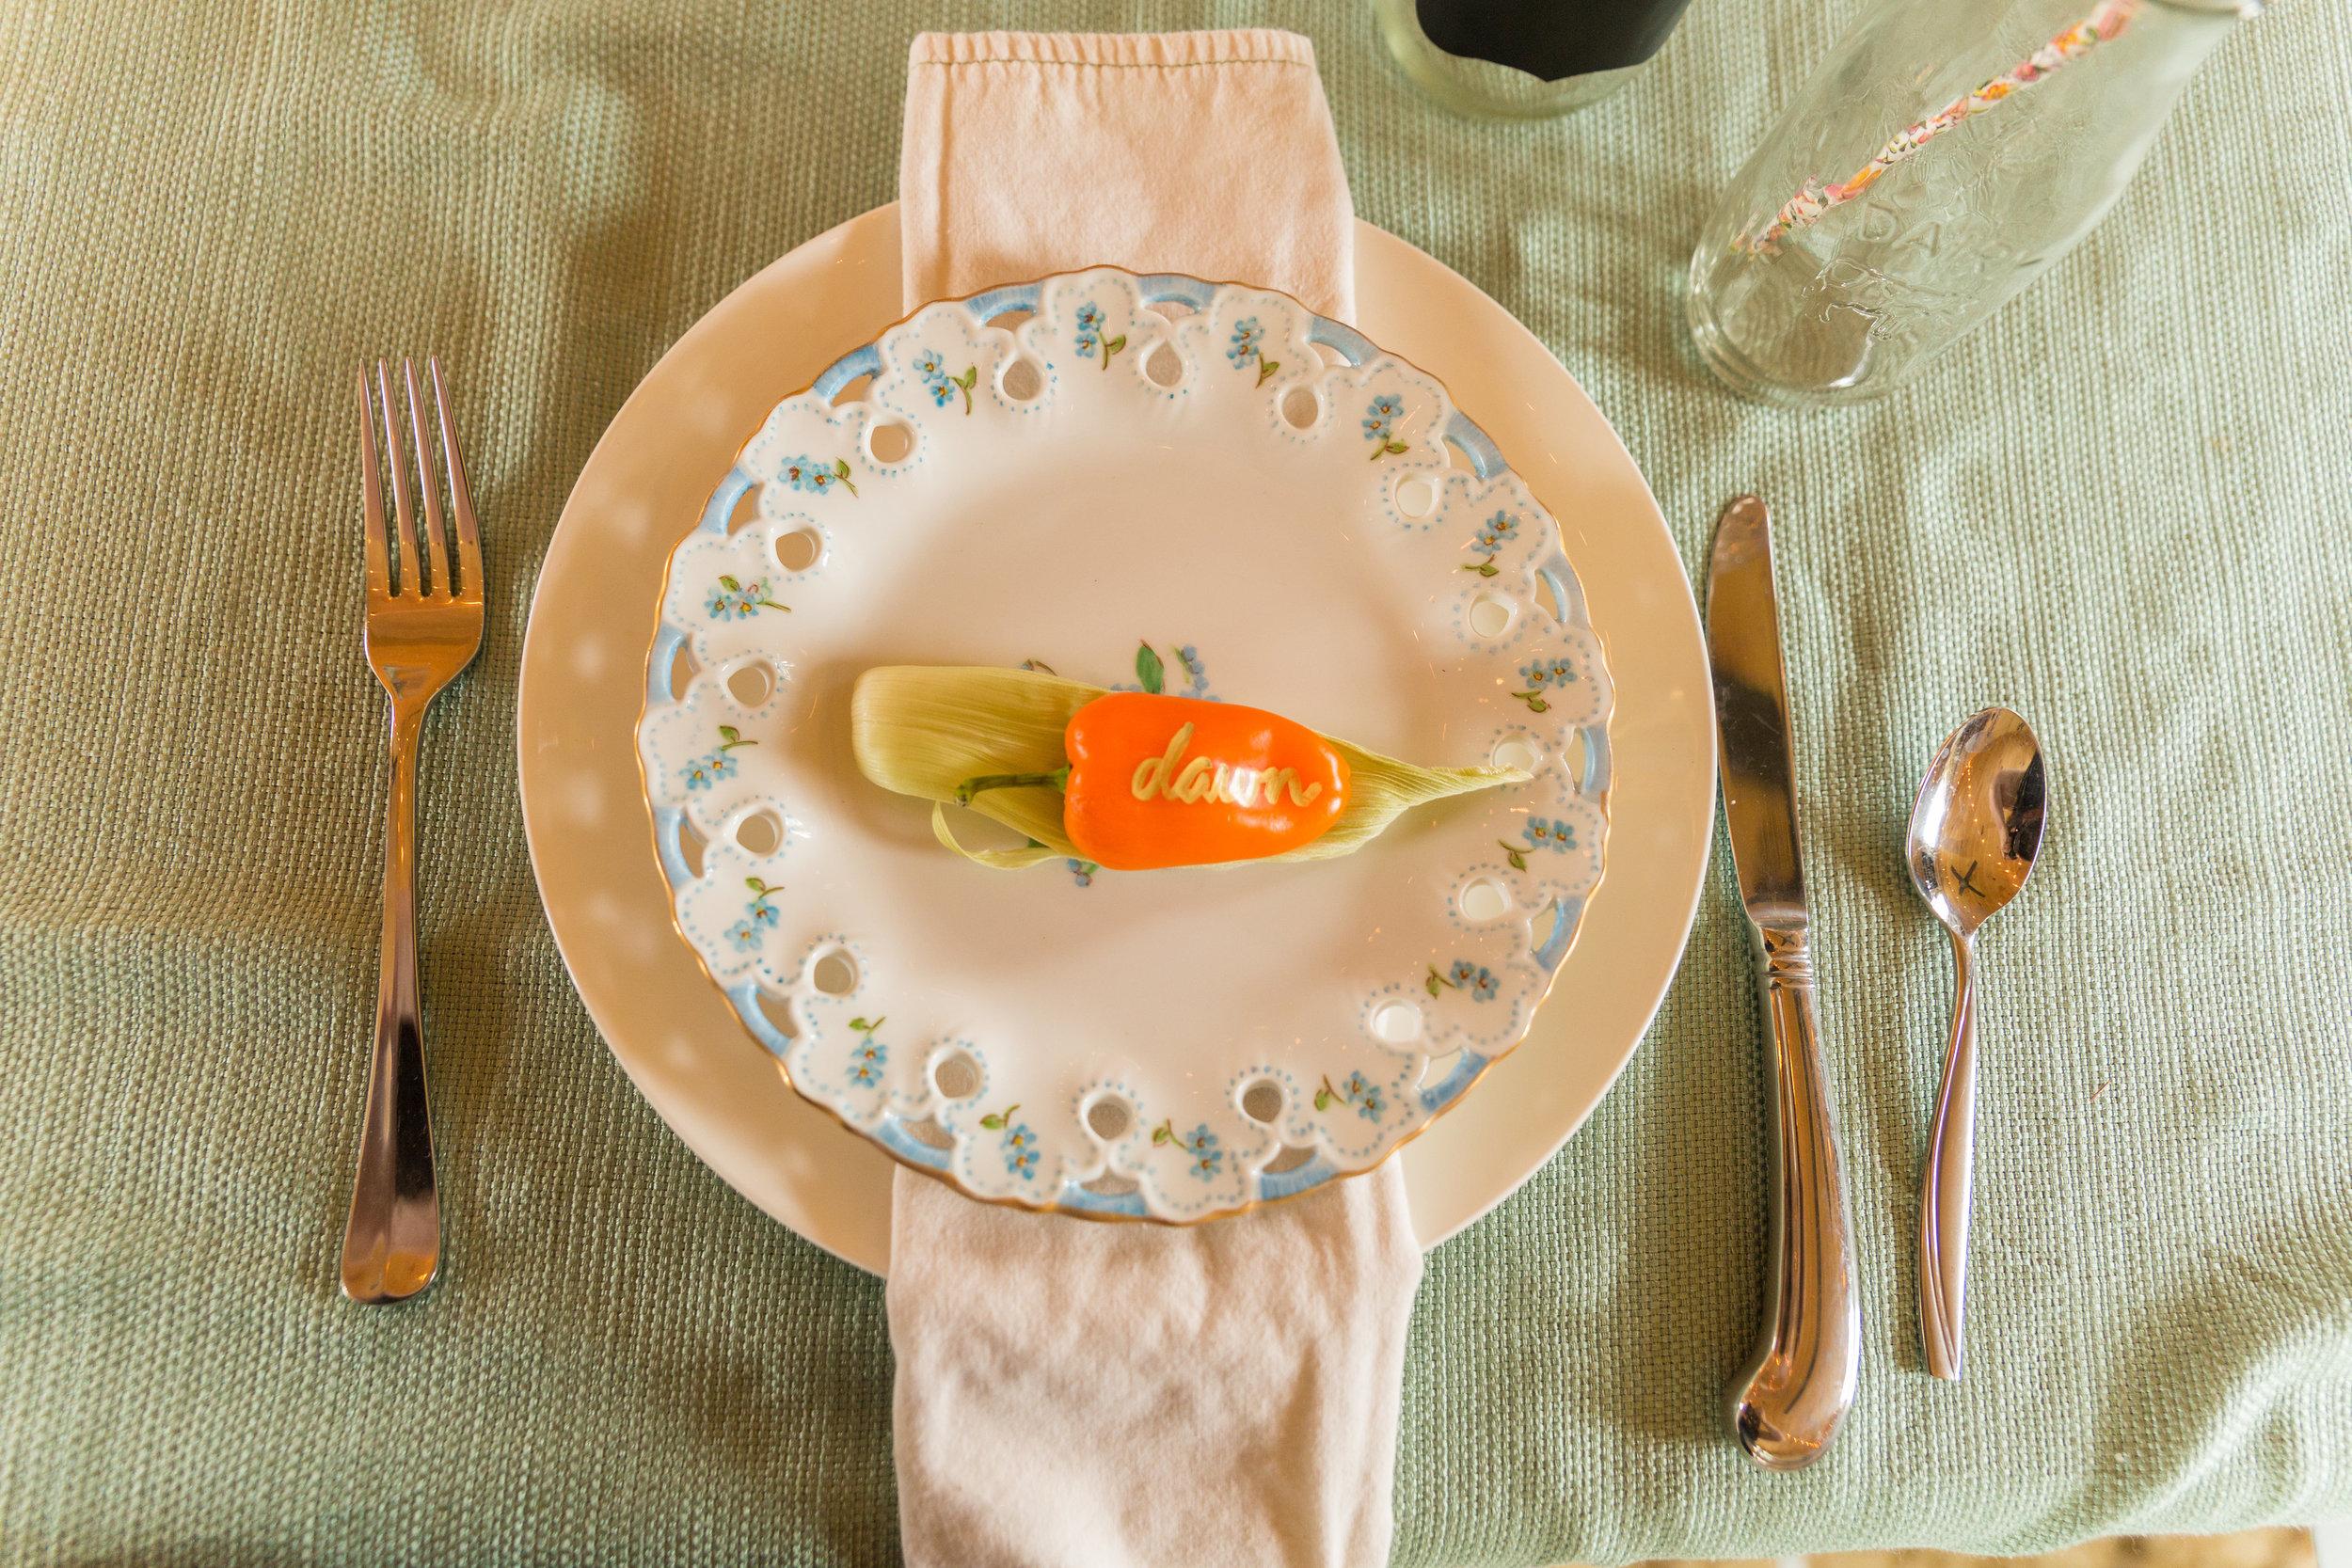 Danielle-Jeff-Farm-to-table-wedding-photography-love-story-studios-0015.jpg